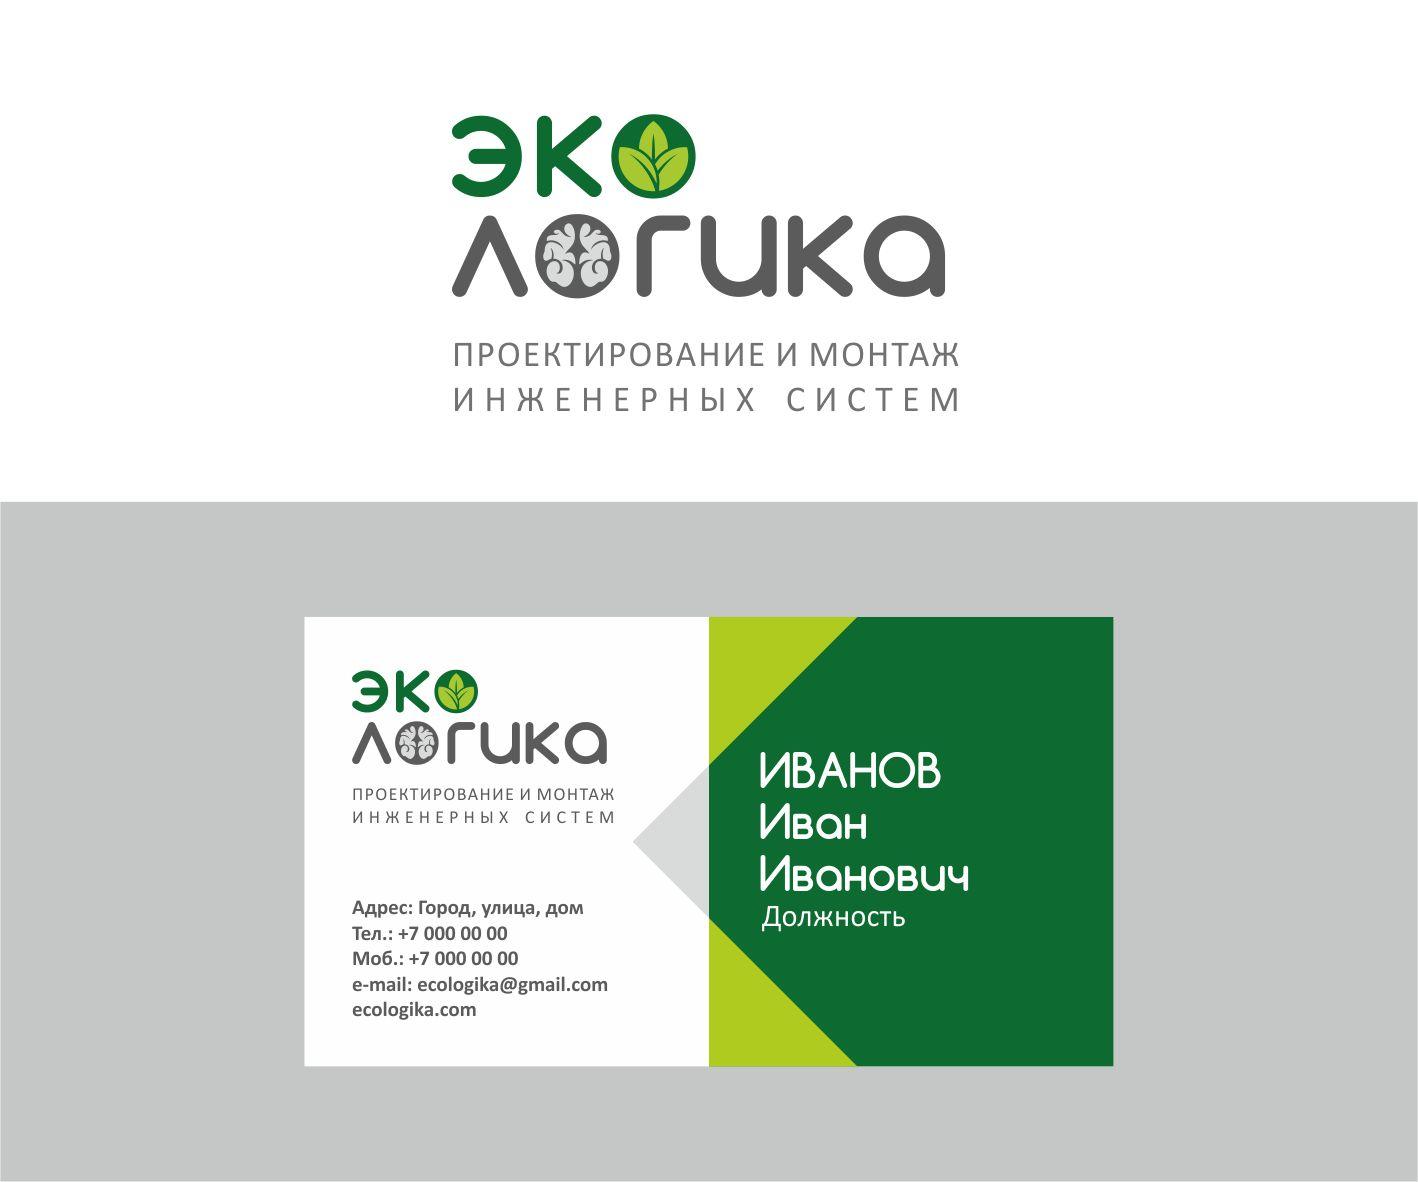 Логотип ЭКОЛОГИКА фото f_775593ec0b6e3de3.jpg